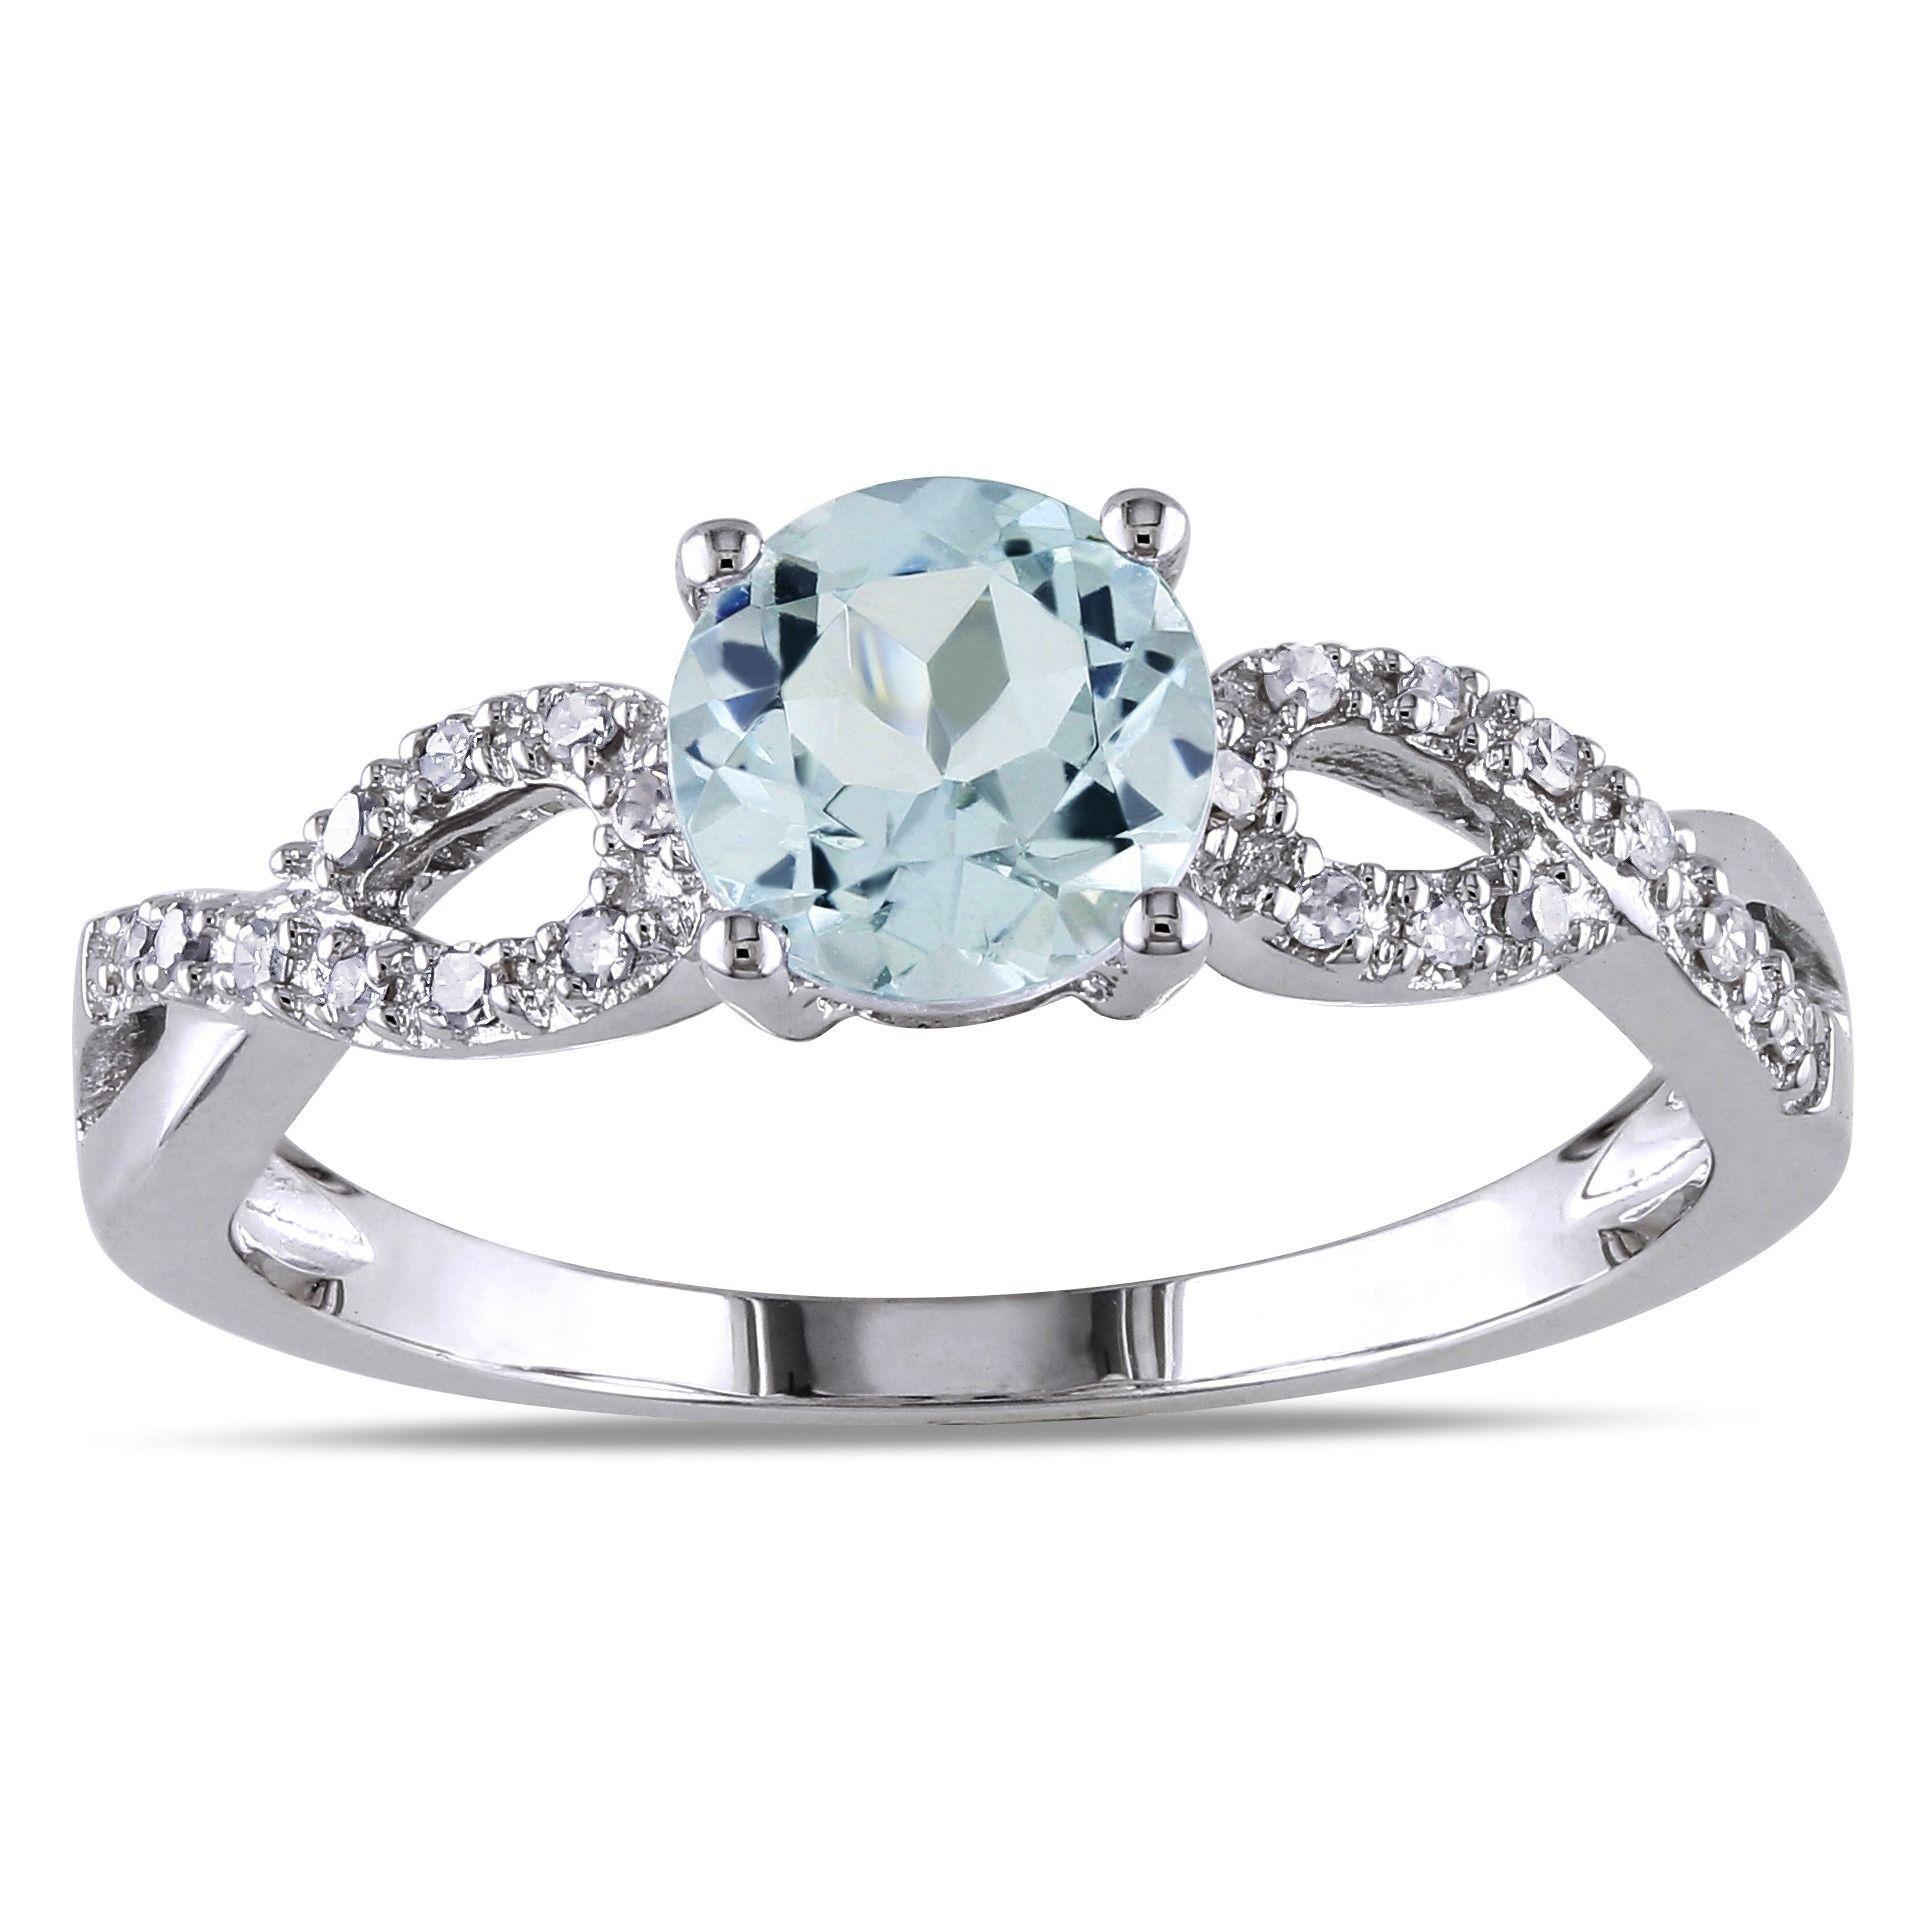 10ct Tdw Diamond Ring (gh, I1i2)  By Miadora